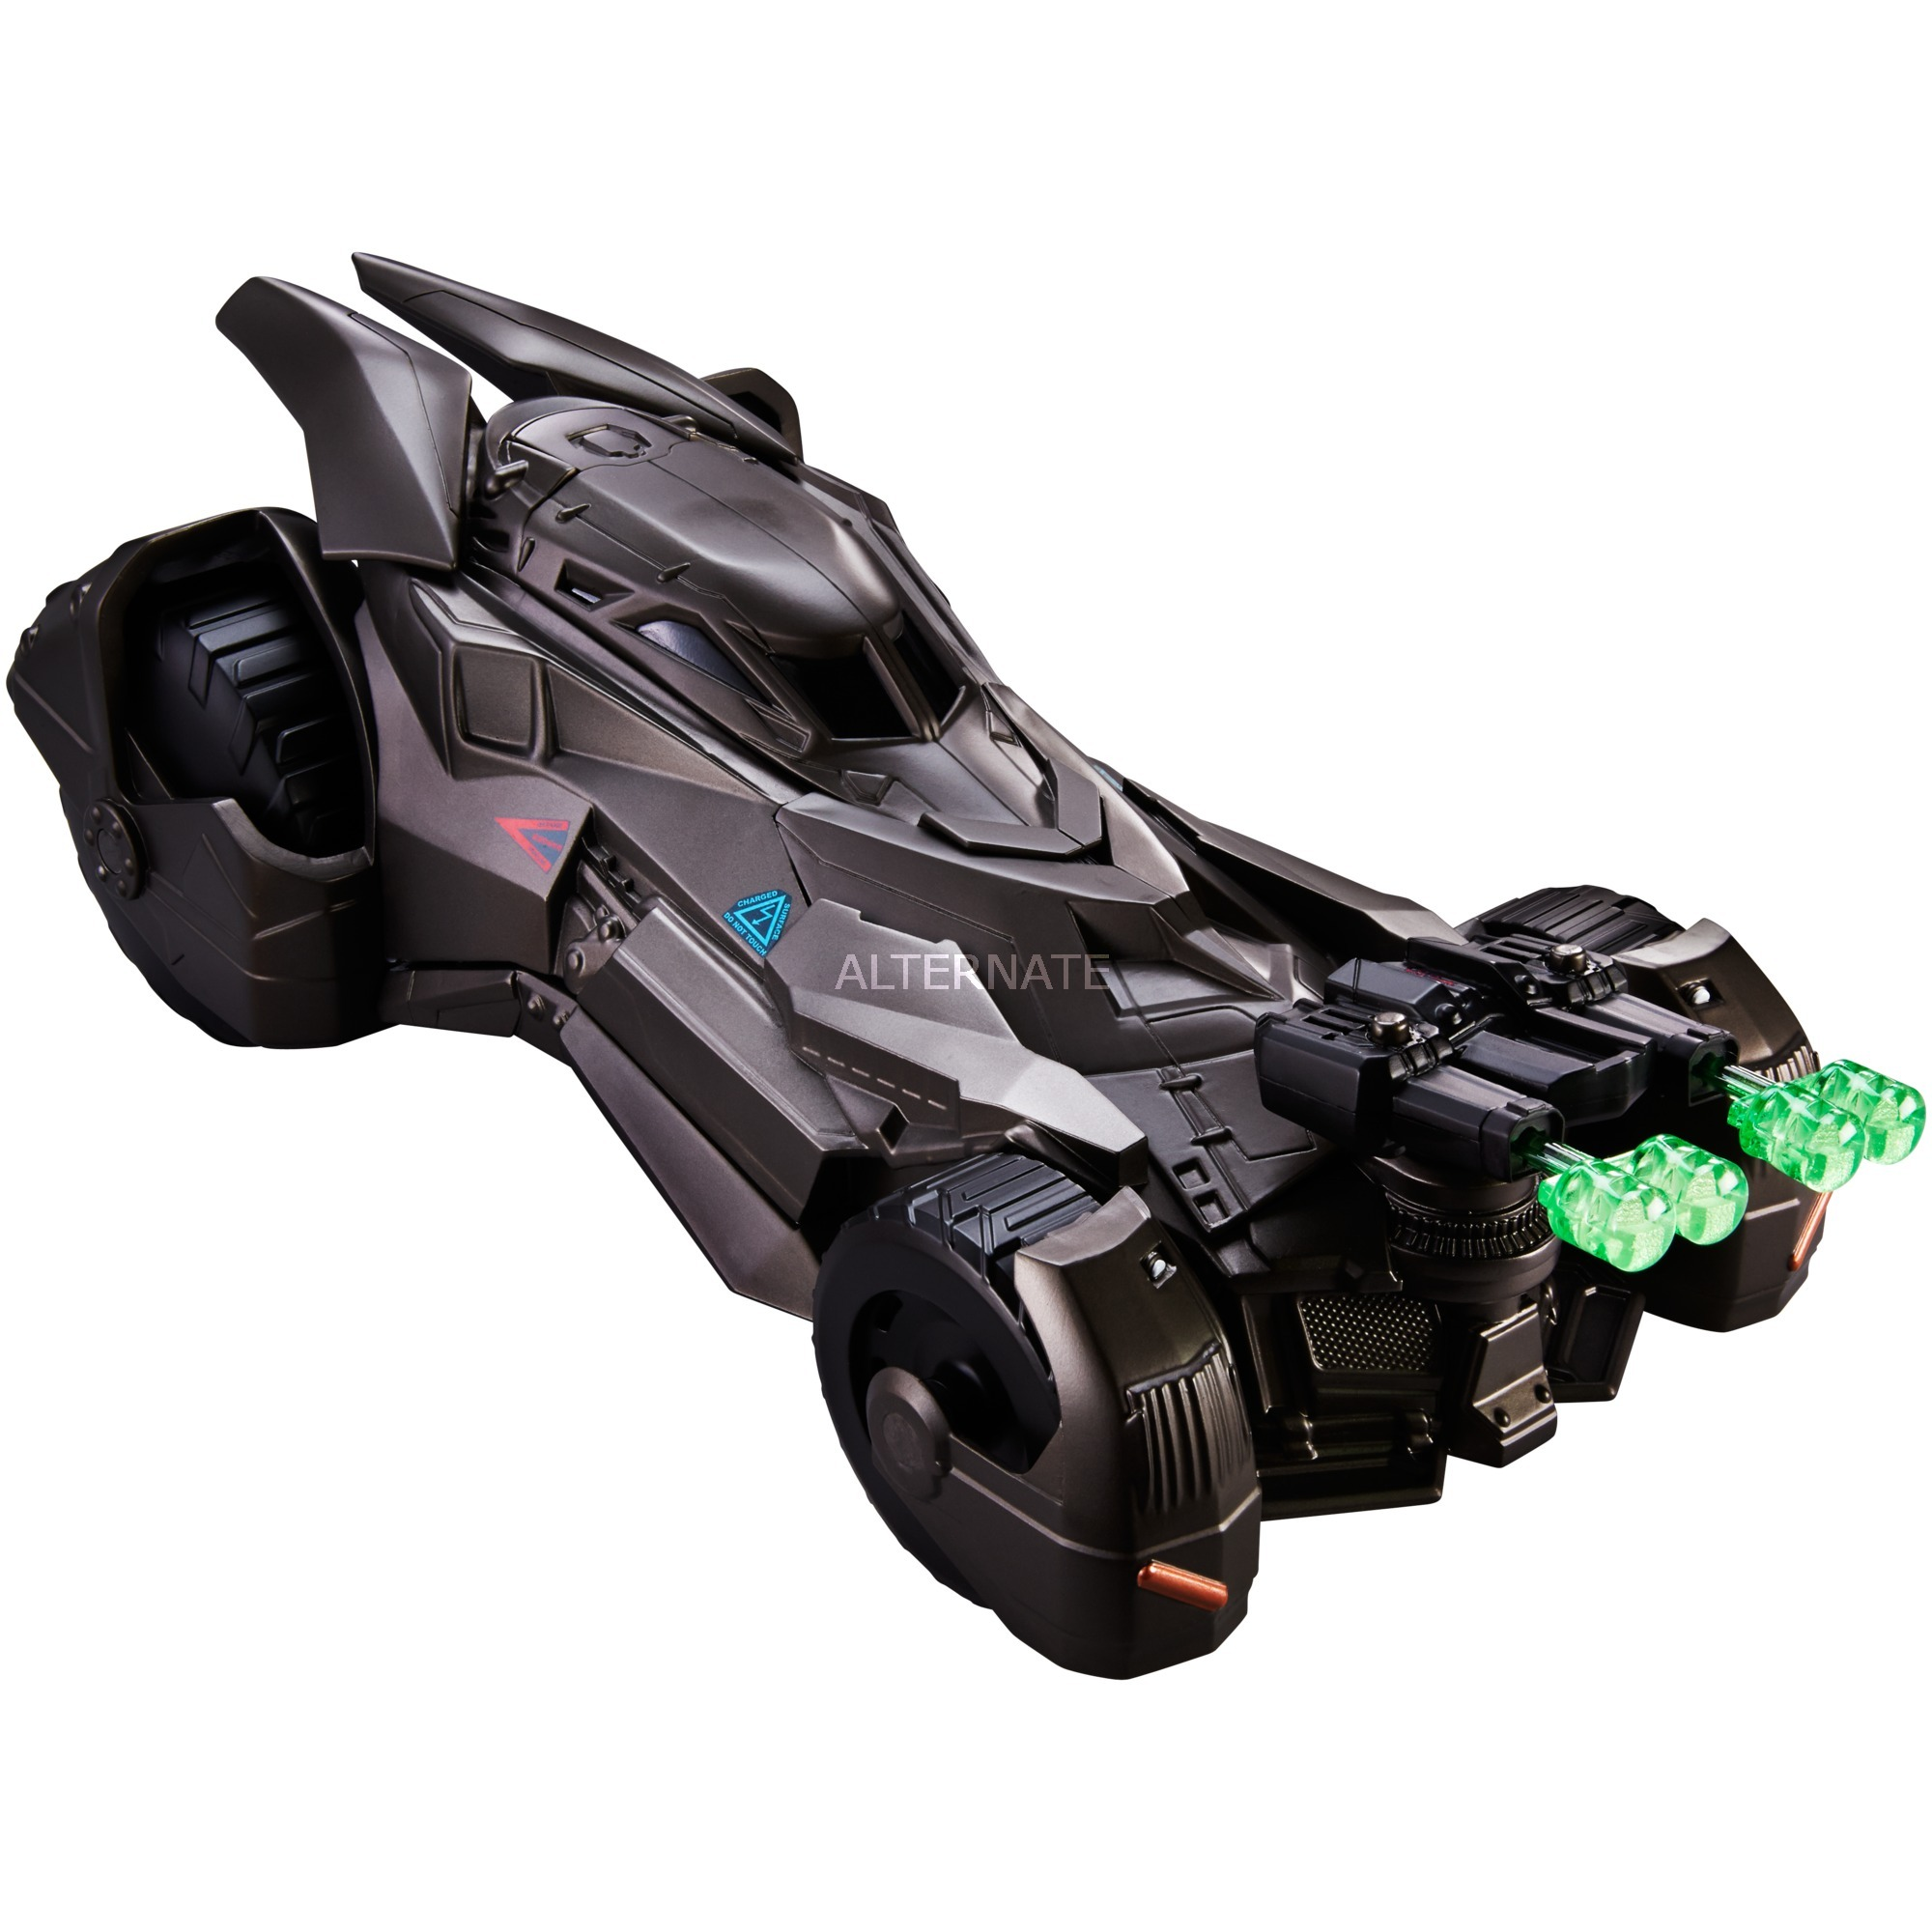 batman-v-superman-deluxe-batmobil-model-koretoj